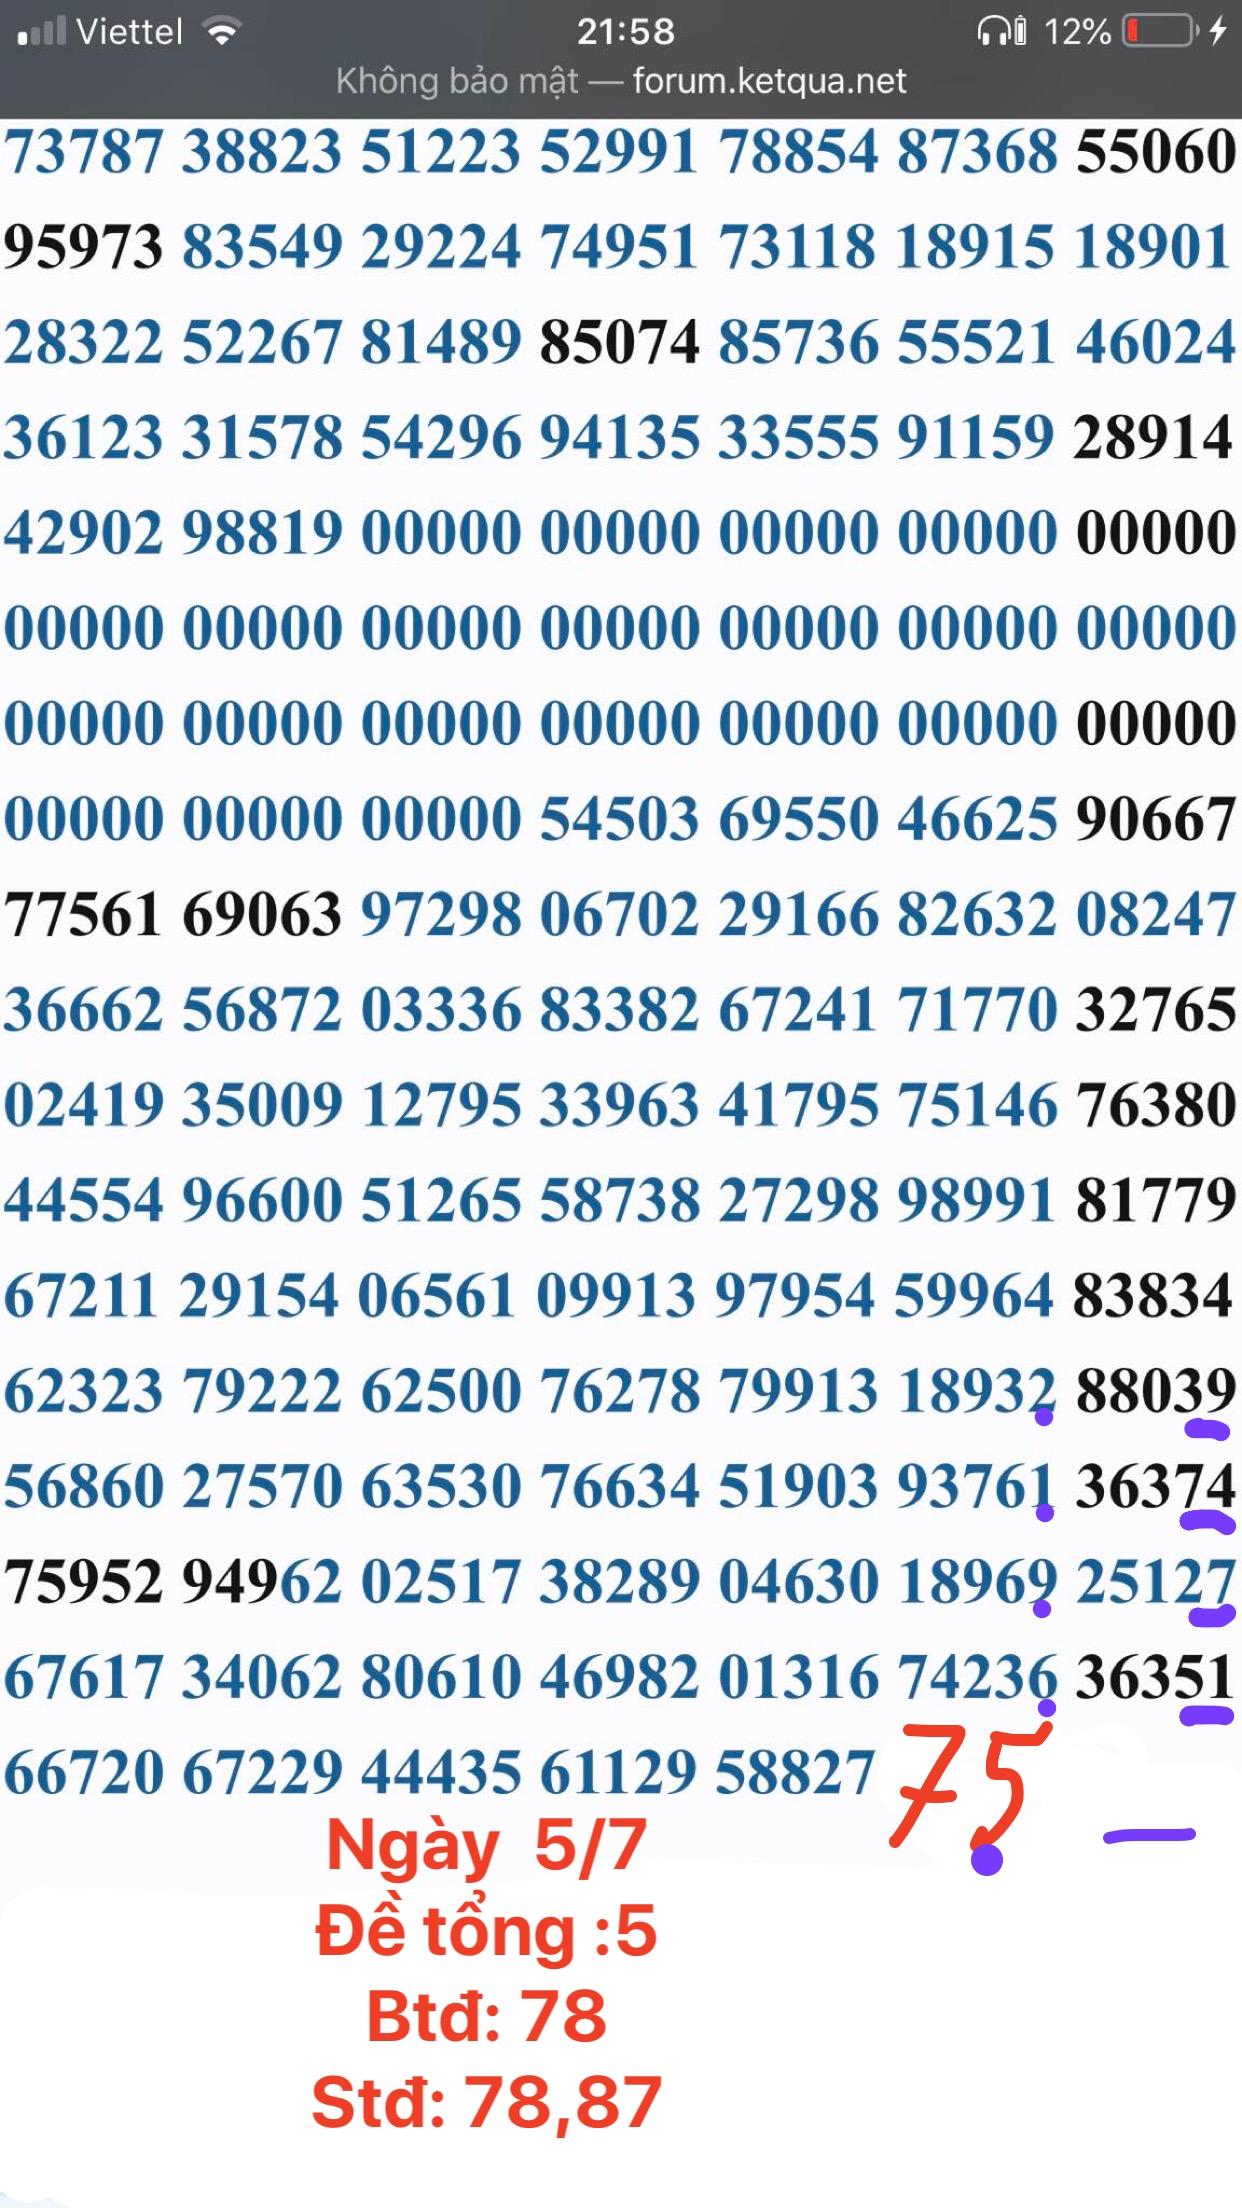 45BFACF3-F348-407E-9FF7-31D26330CBFC.jpeg